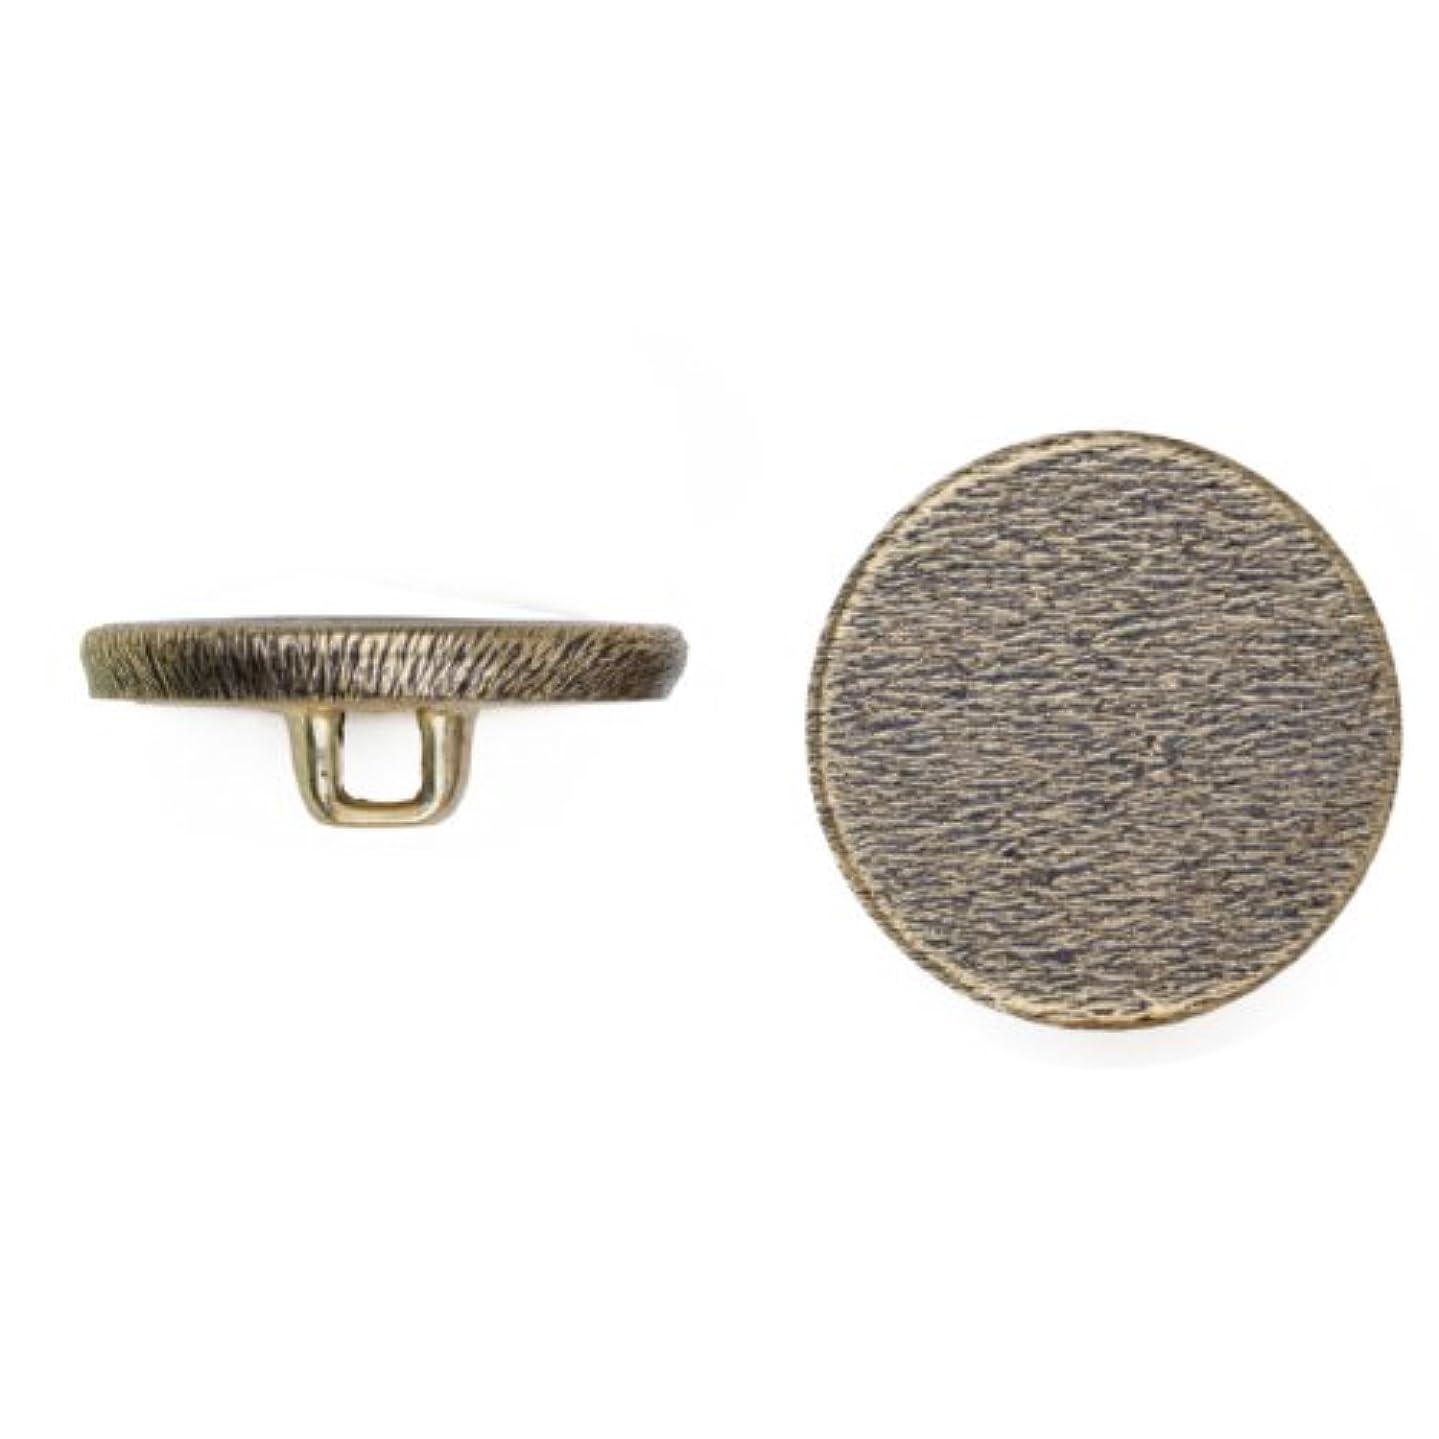 C&C Metal Products 5051 Flat Florentine Metal Button, Size 33 Ligne, Antique Gold, 36-Pack